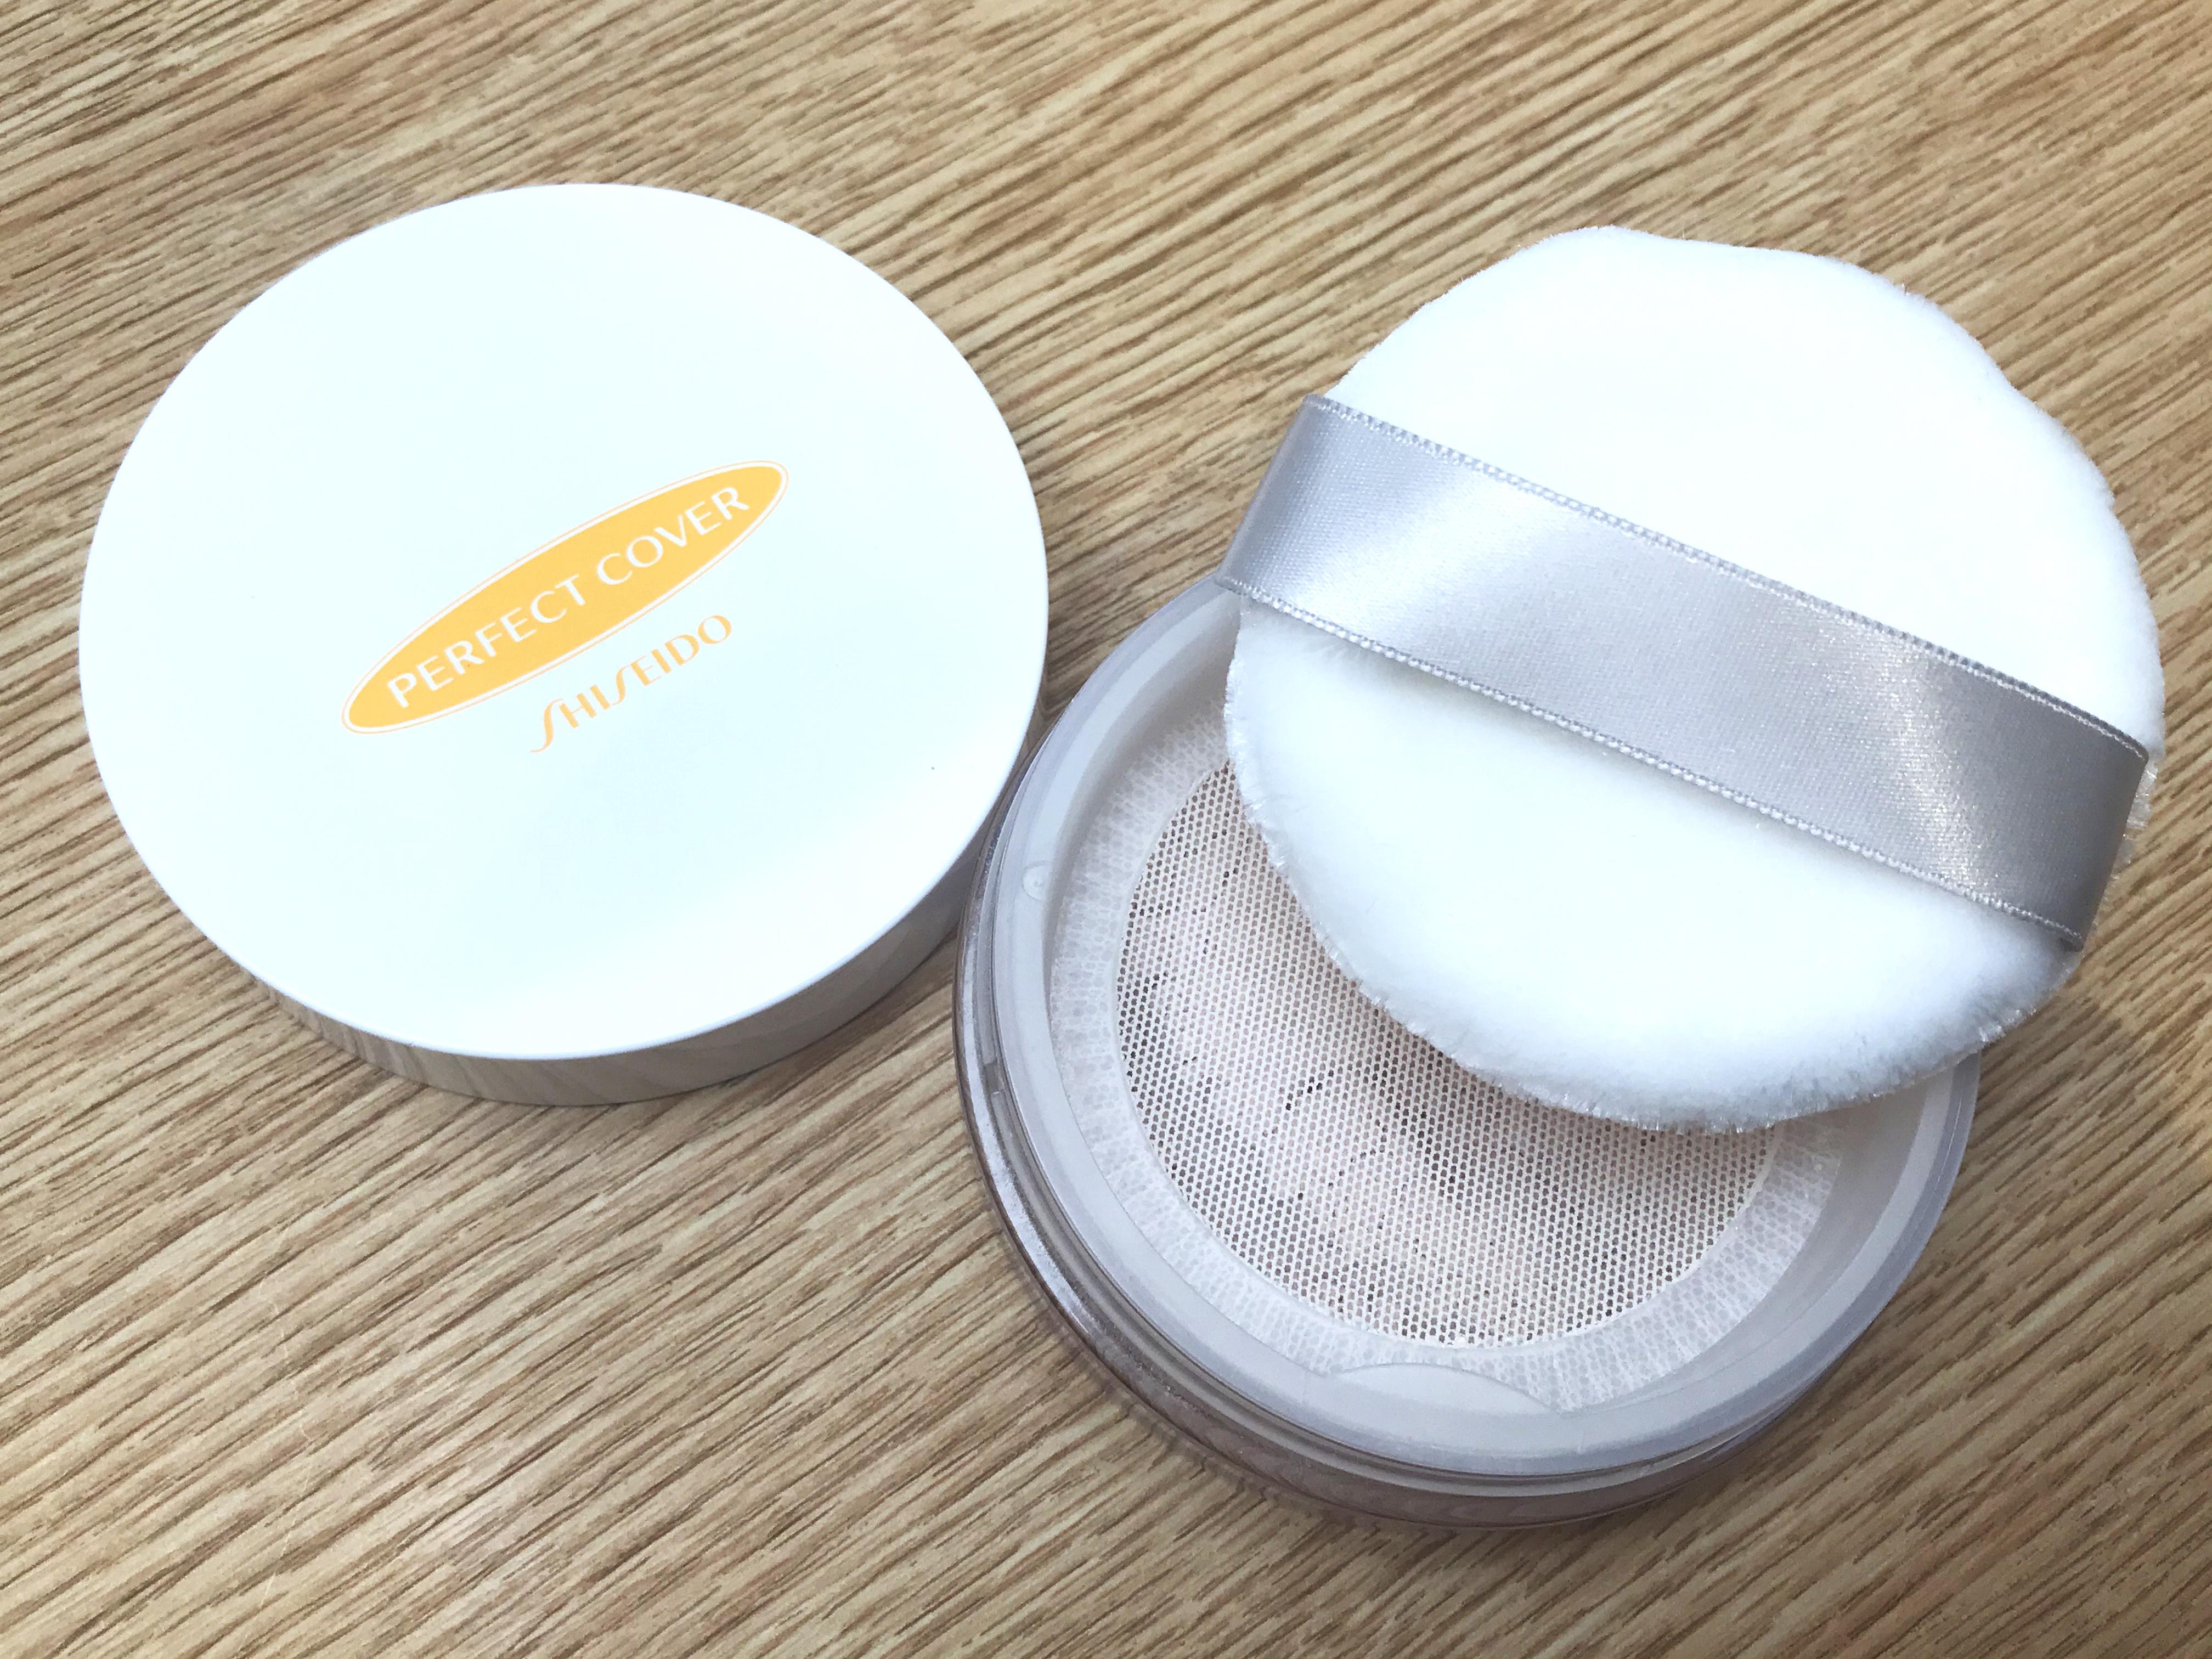 Shiseido Perfect Cover Loose Powder